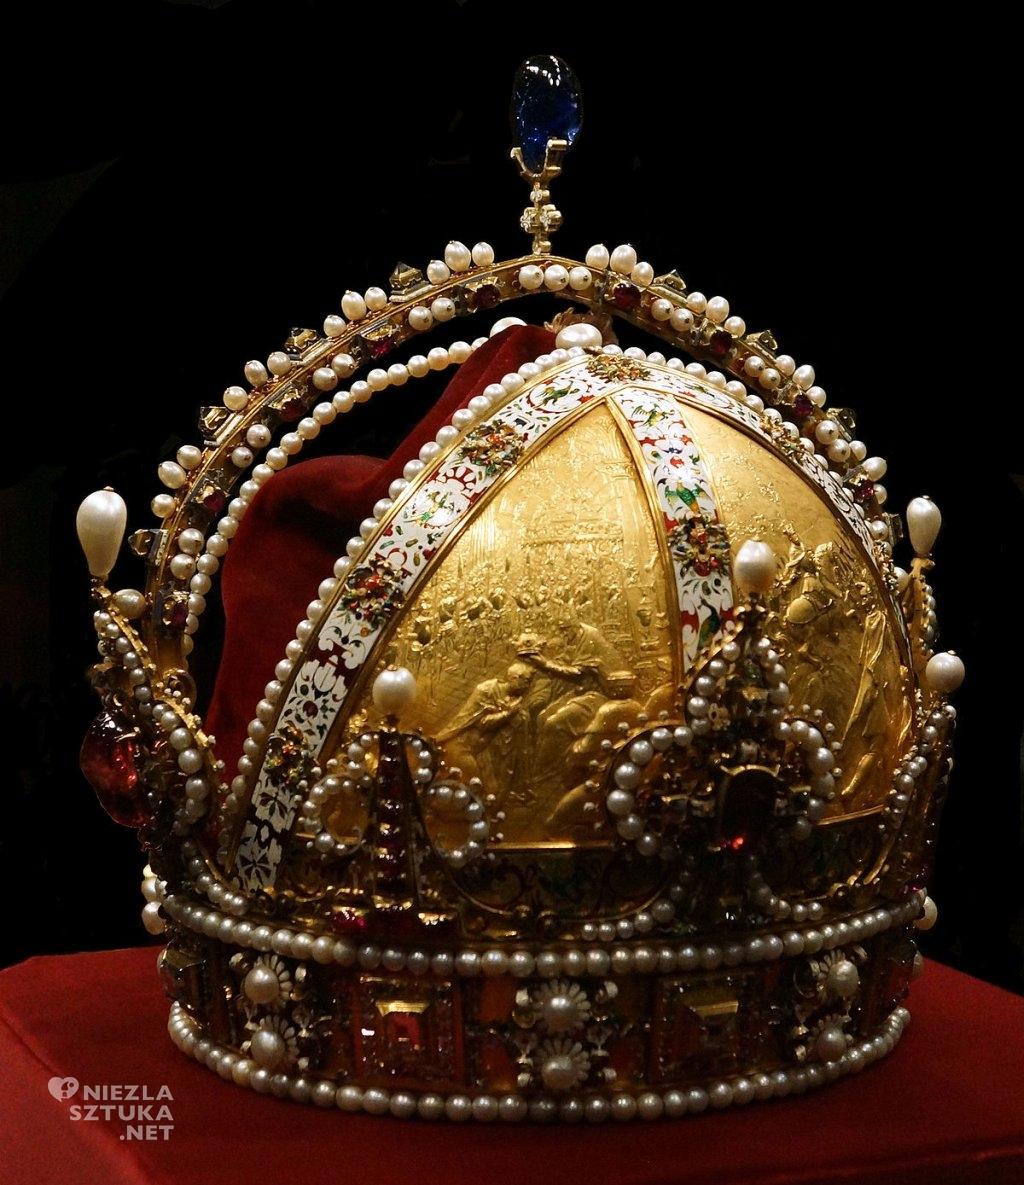 Cesarska korona Austrii